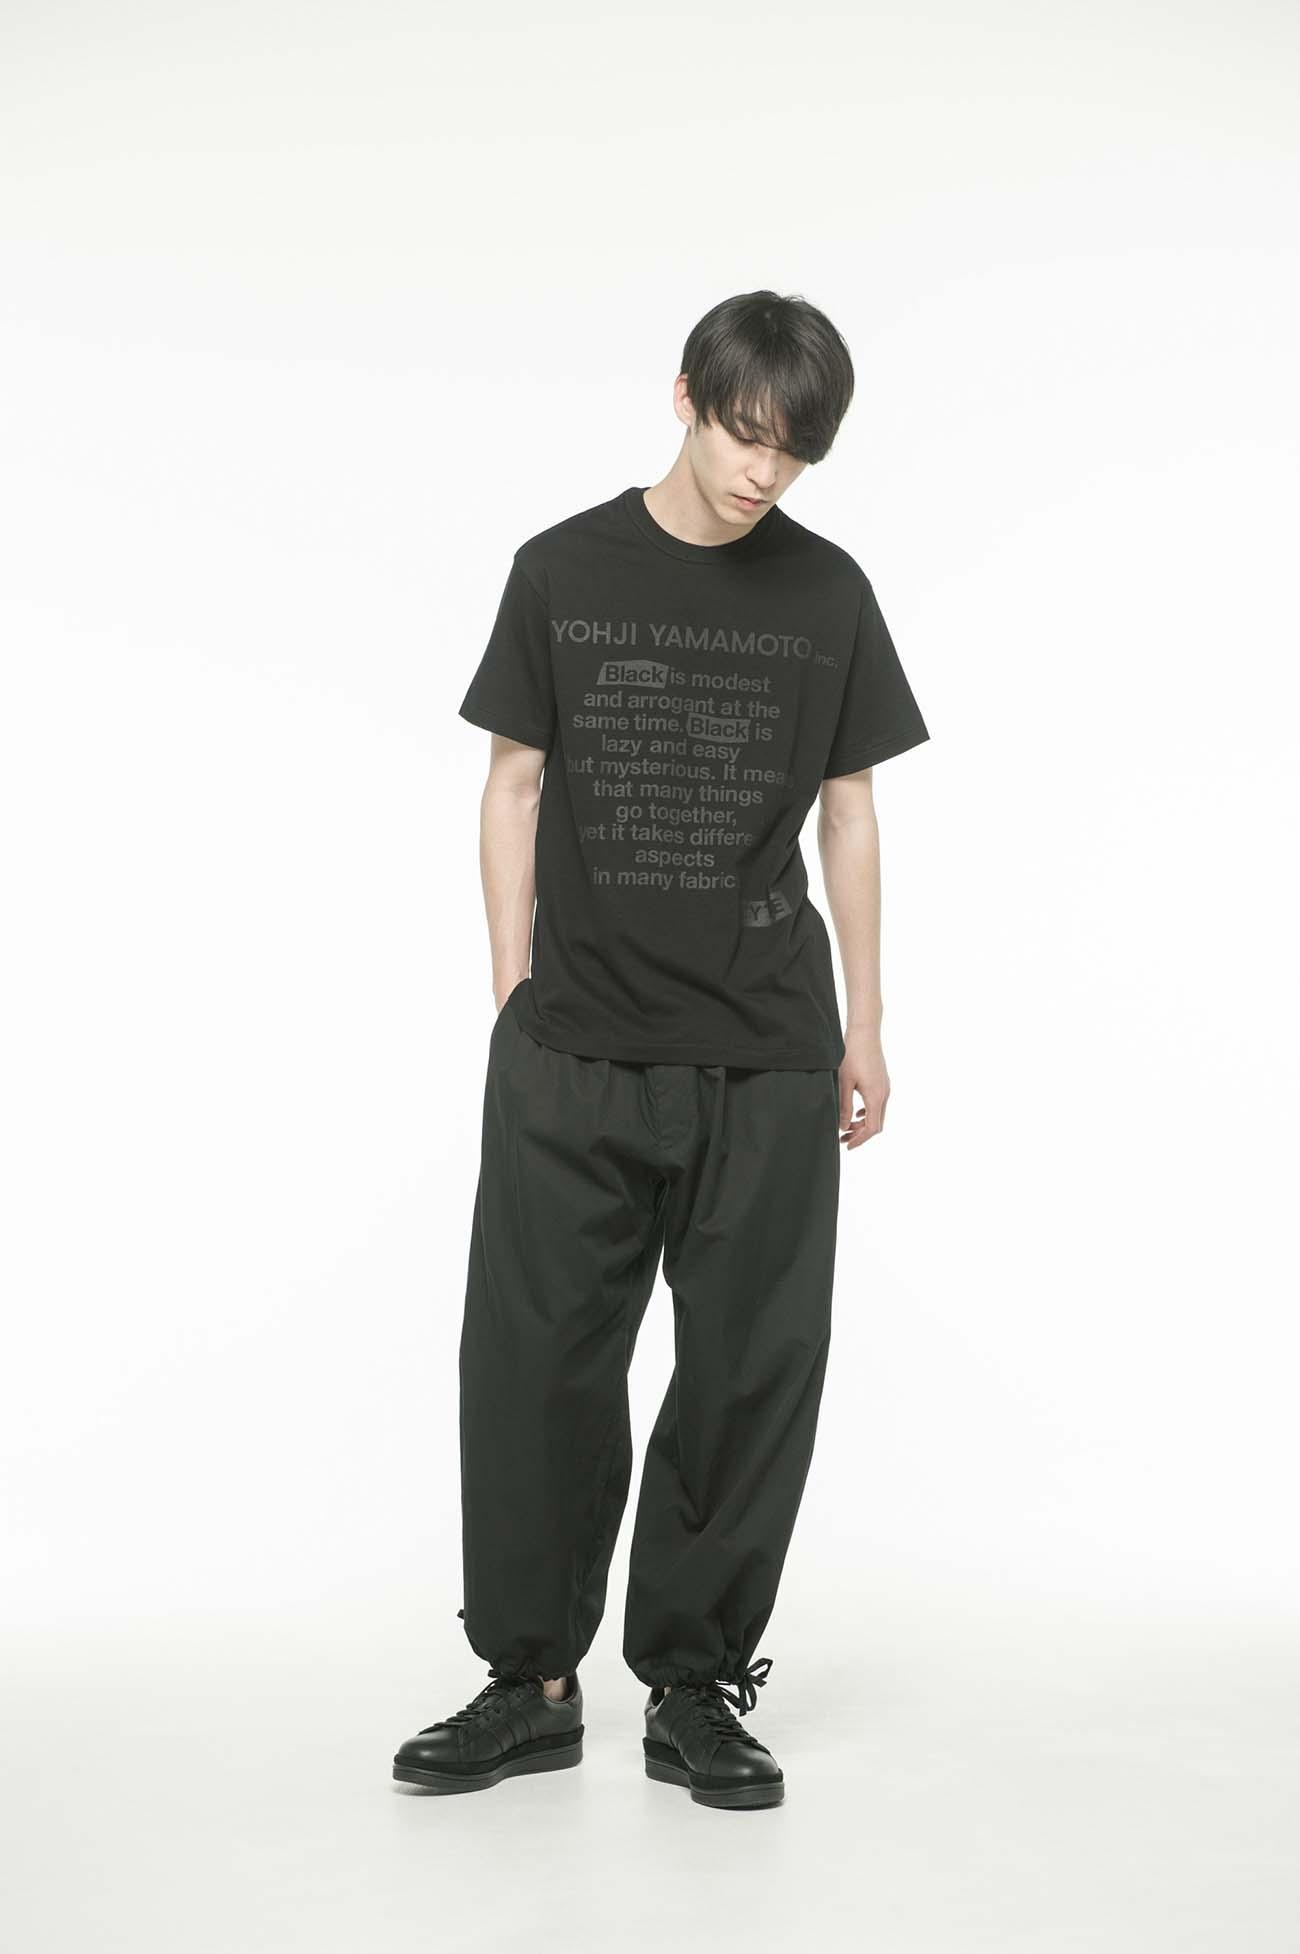 20/CottonJersey「Black Is Modest」Message T-Shirt